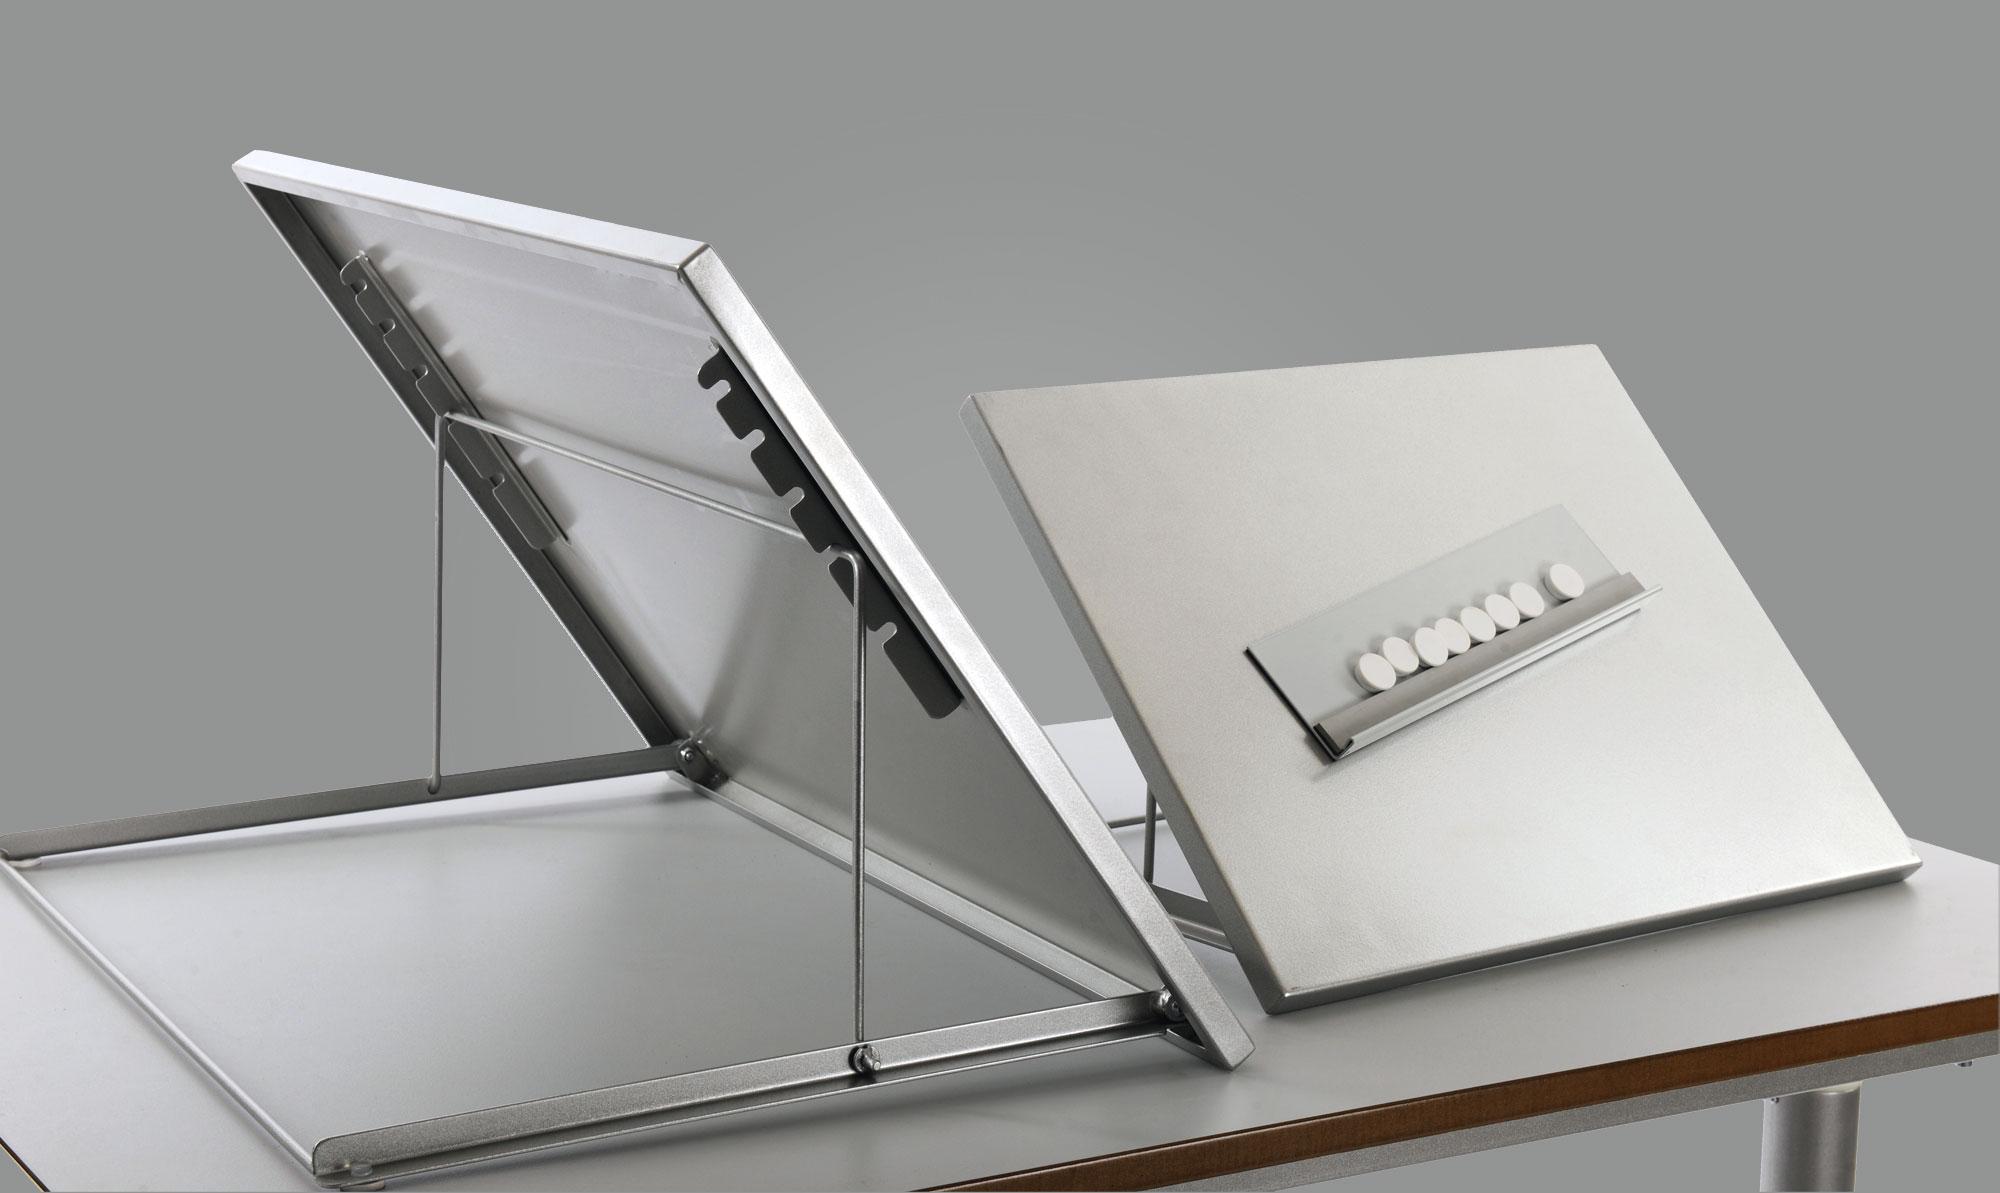 Hephaïstos mobilier ergonomique Sati table ergonomique